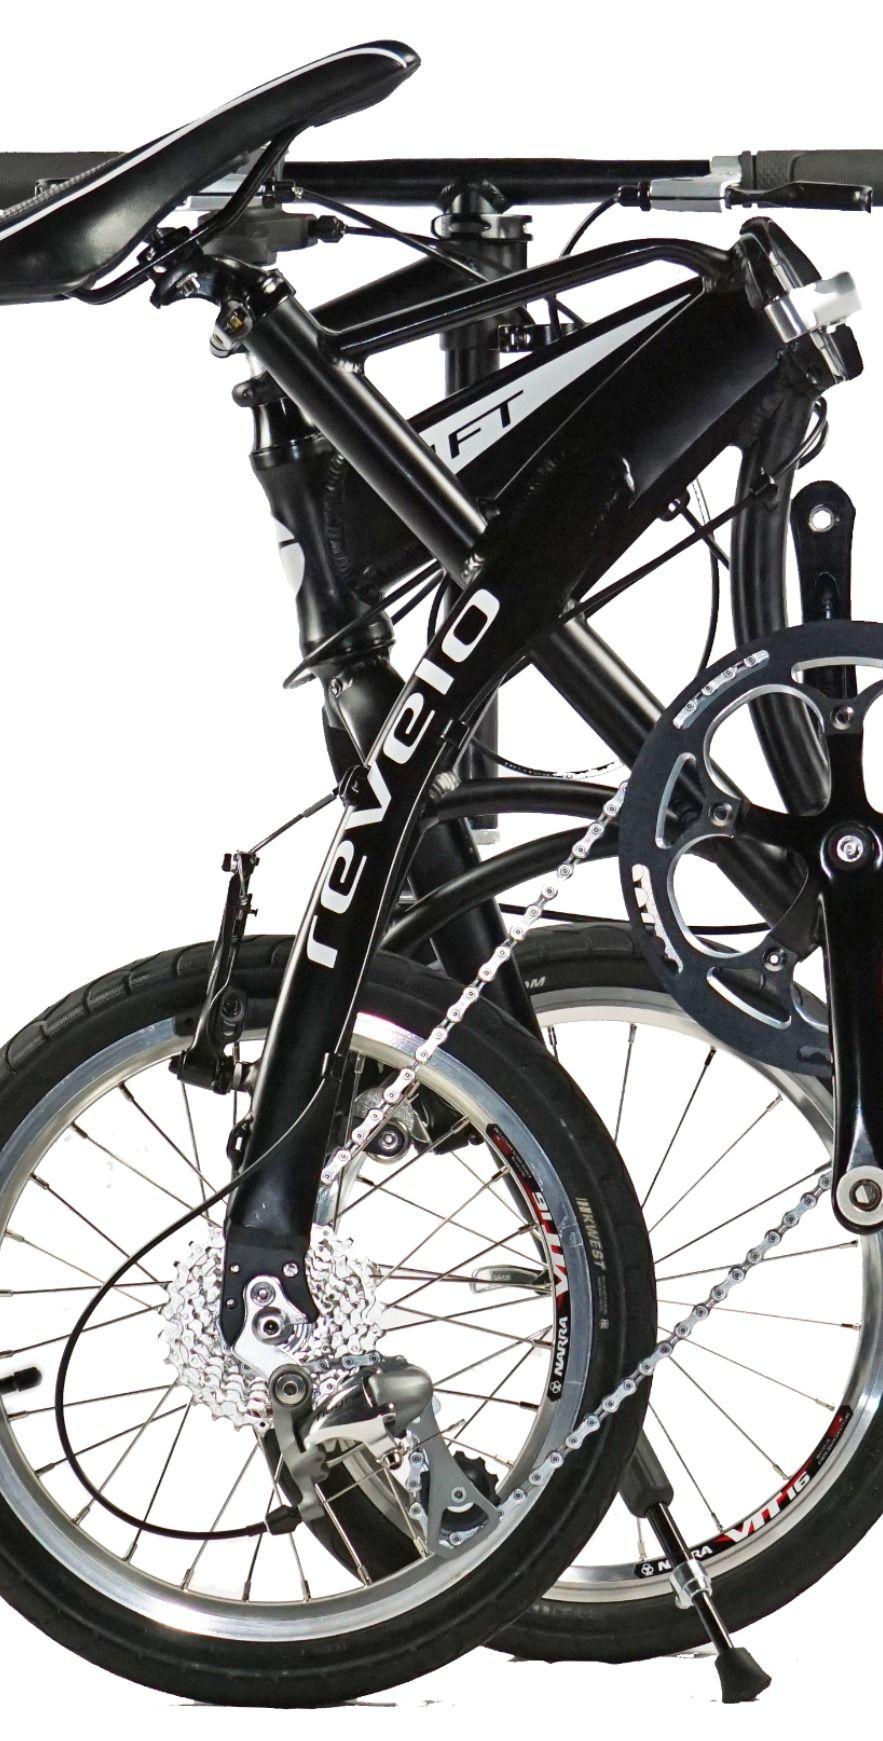 The Best Folding Bike Design In 40 Years Foldingbike Folding Bike